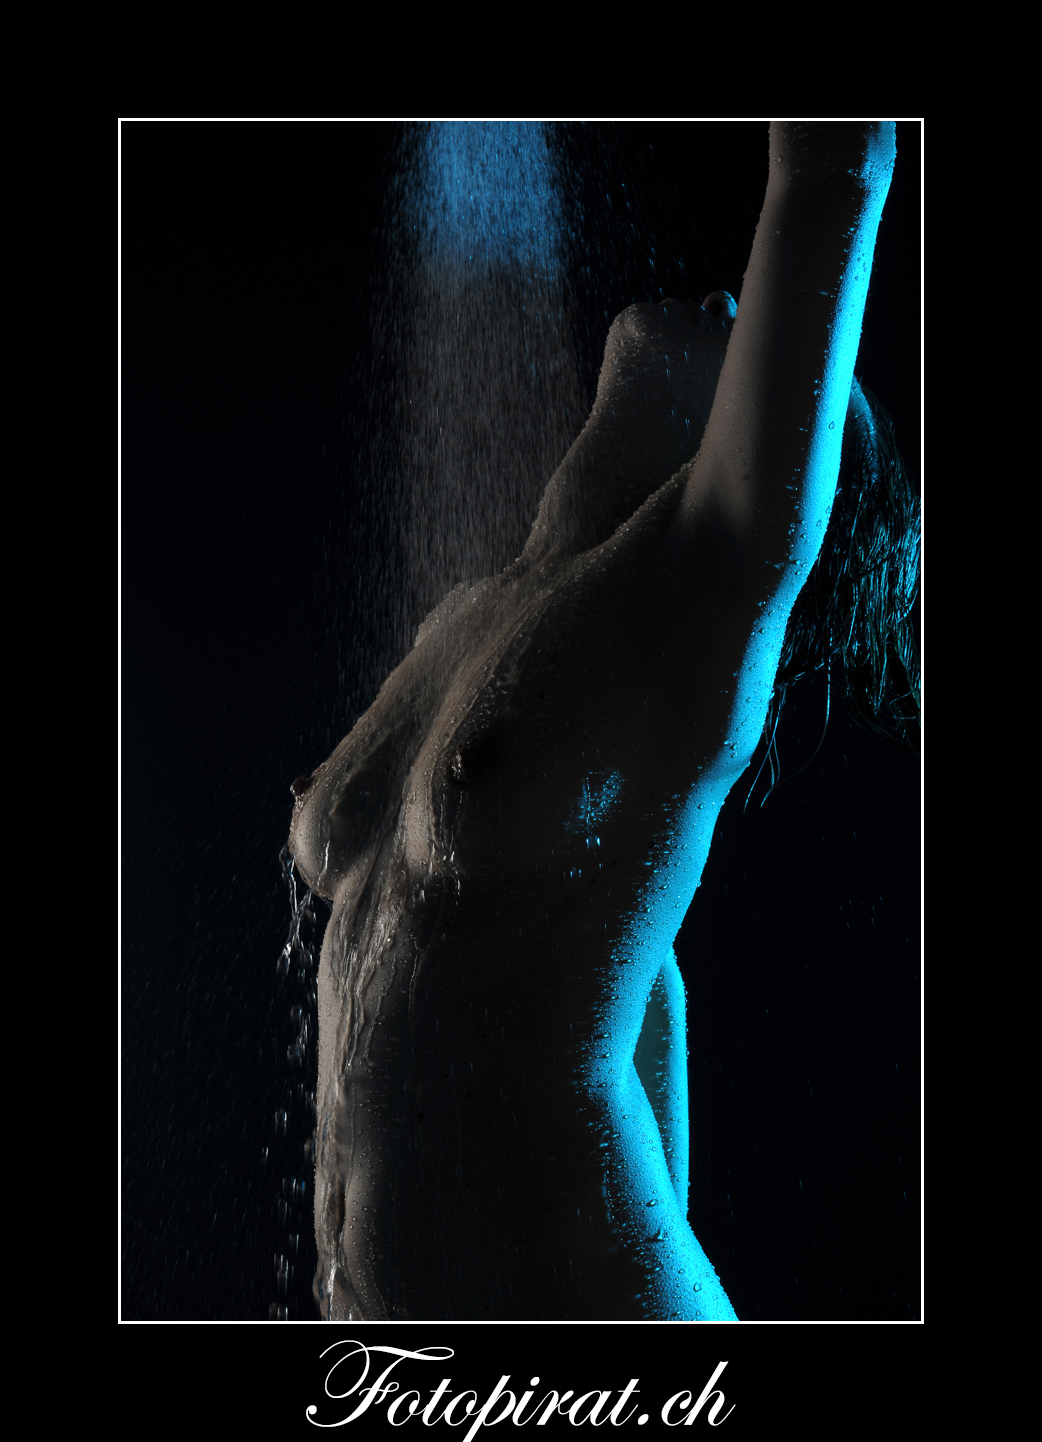 Fotoshooting, Fotostudio, Akt, Nackt, Nudeart, Nude, Modelagentur, Fotomodel, Strapse, Po, erotik, fotomodel werden, Duschshooting